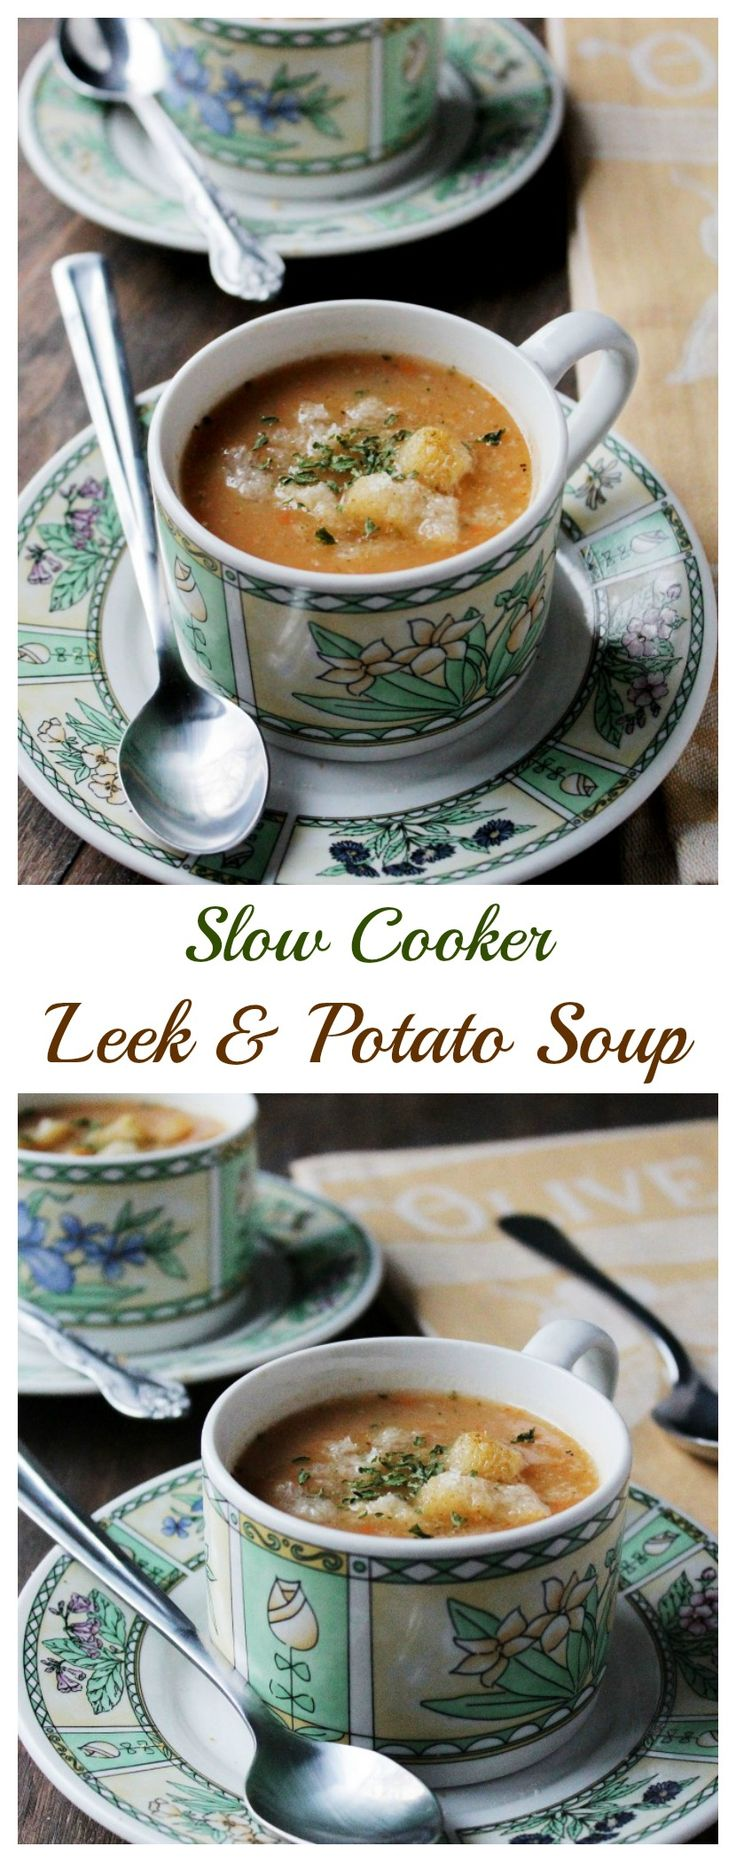 {France} Slow Cooker Leek and Potato Soup | www.diethood.com | #crockpot #dinner